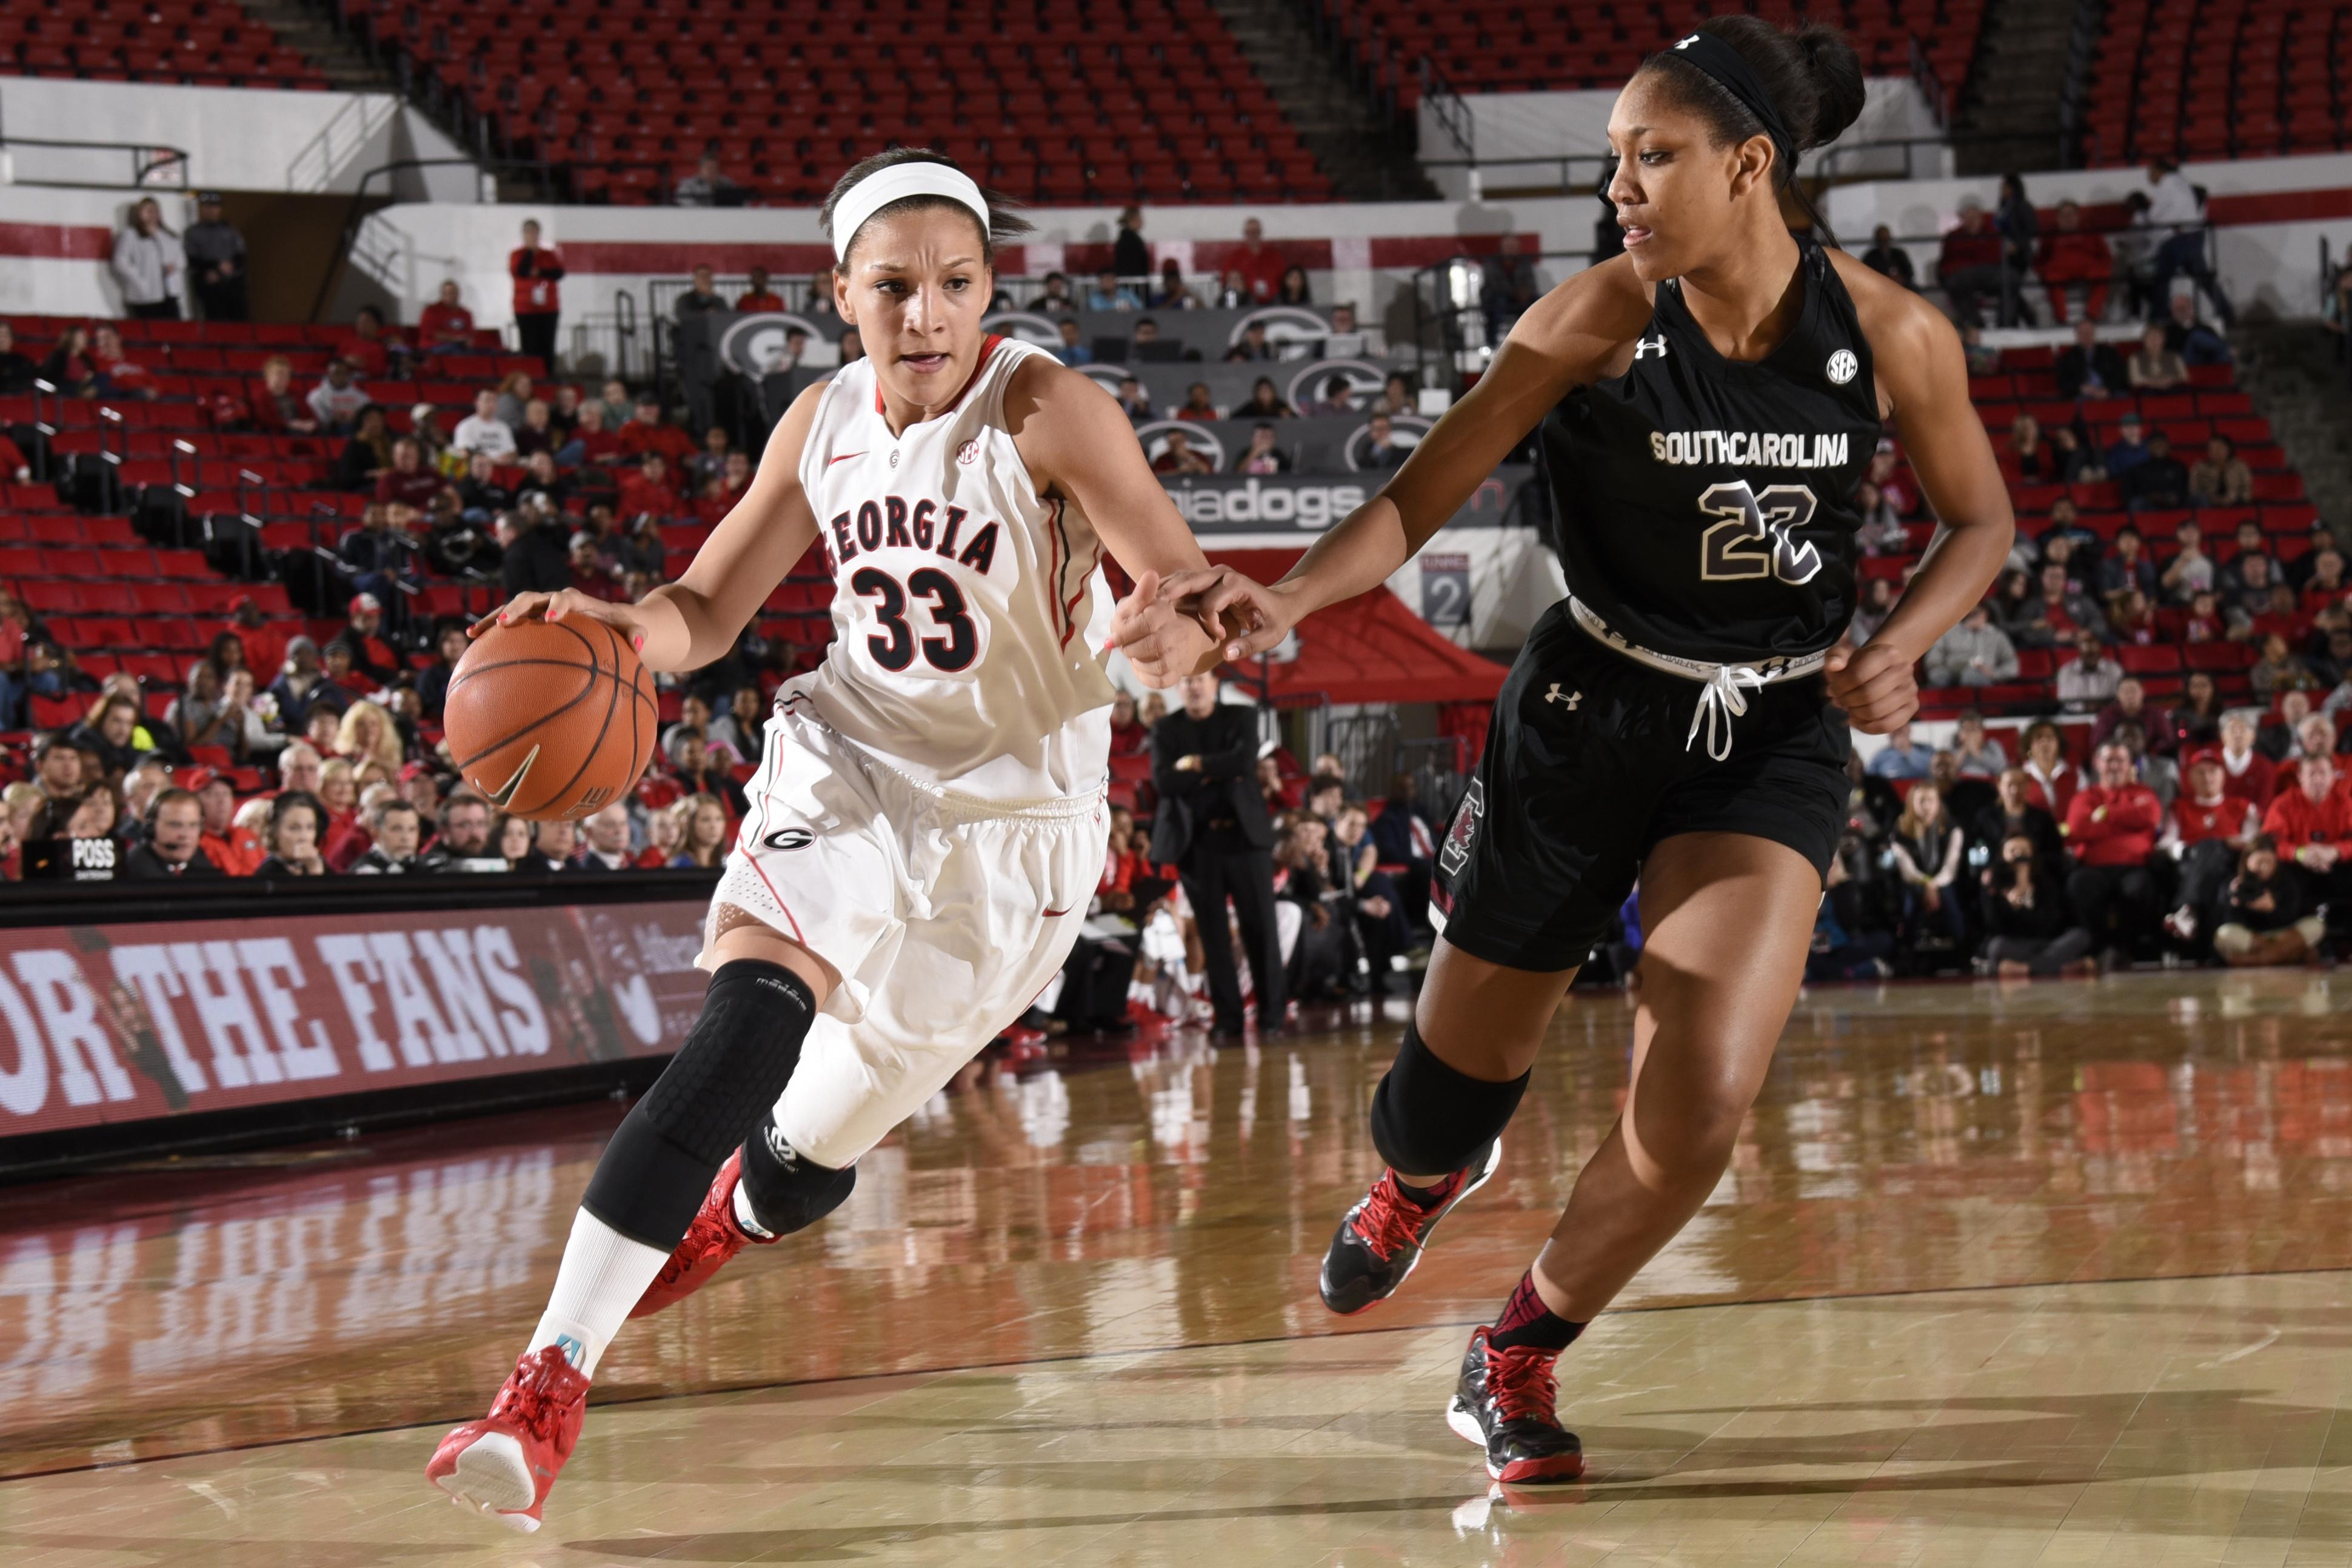 NCAA Womens Basketball: South Carolina at Georgia